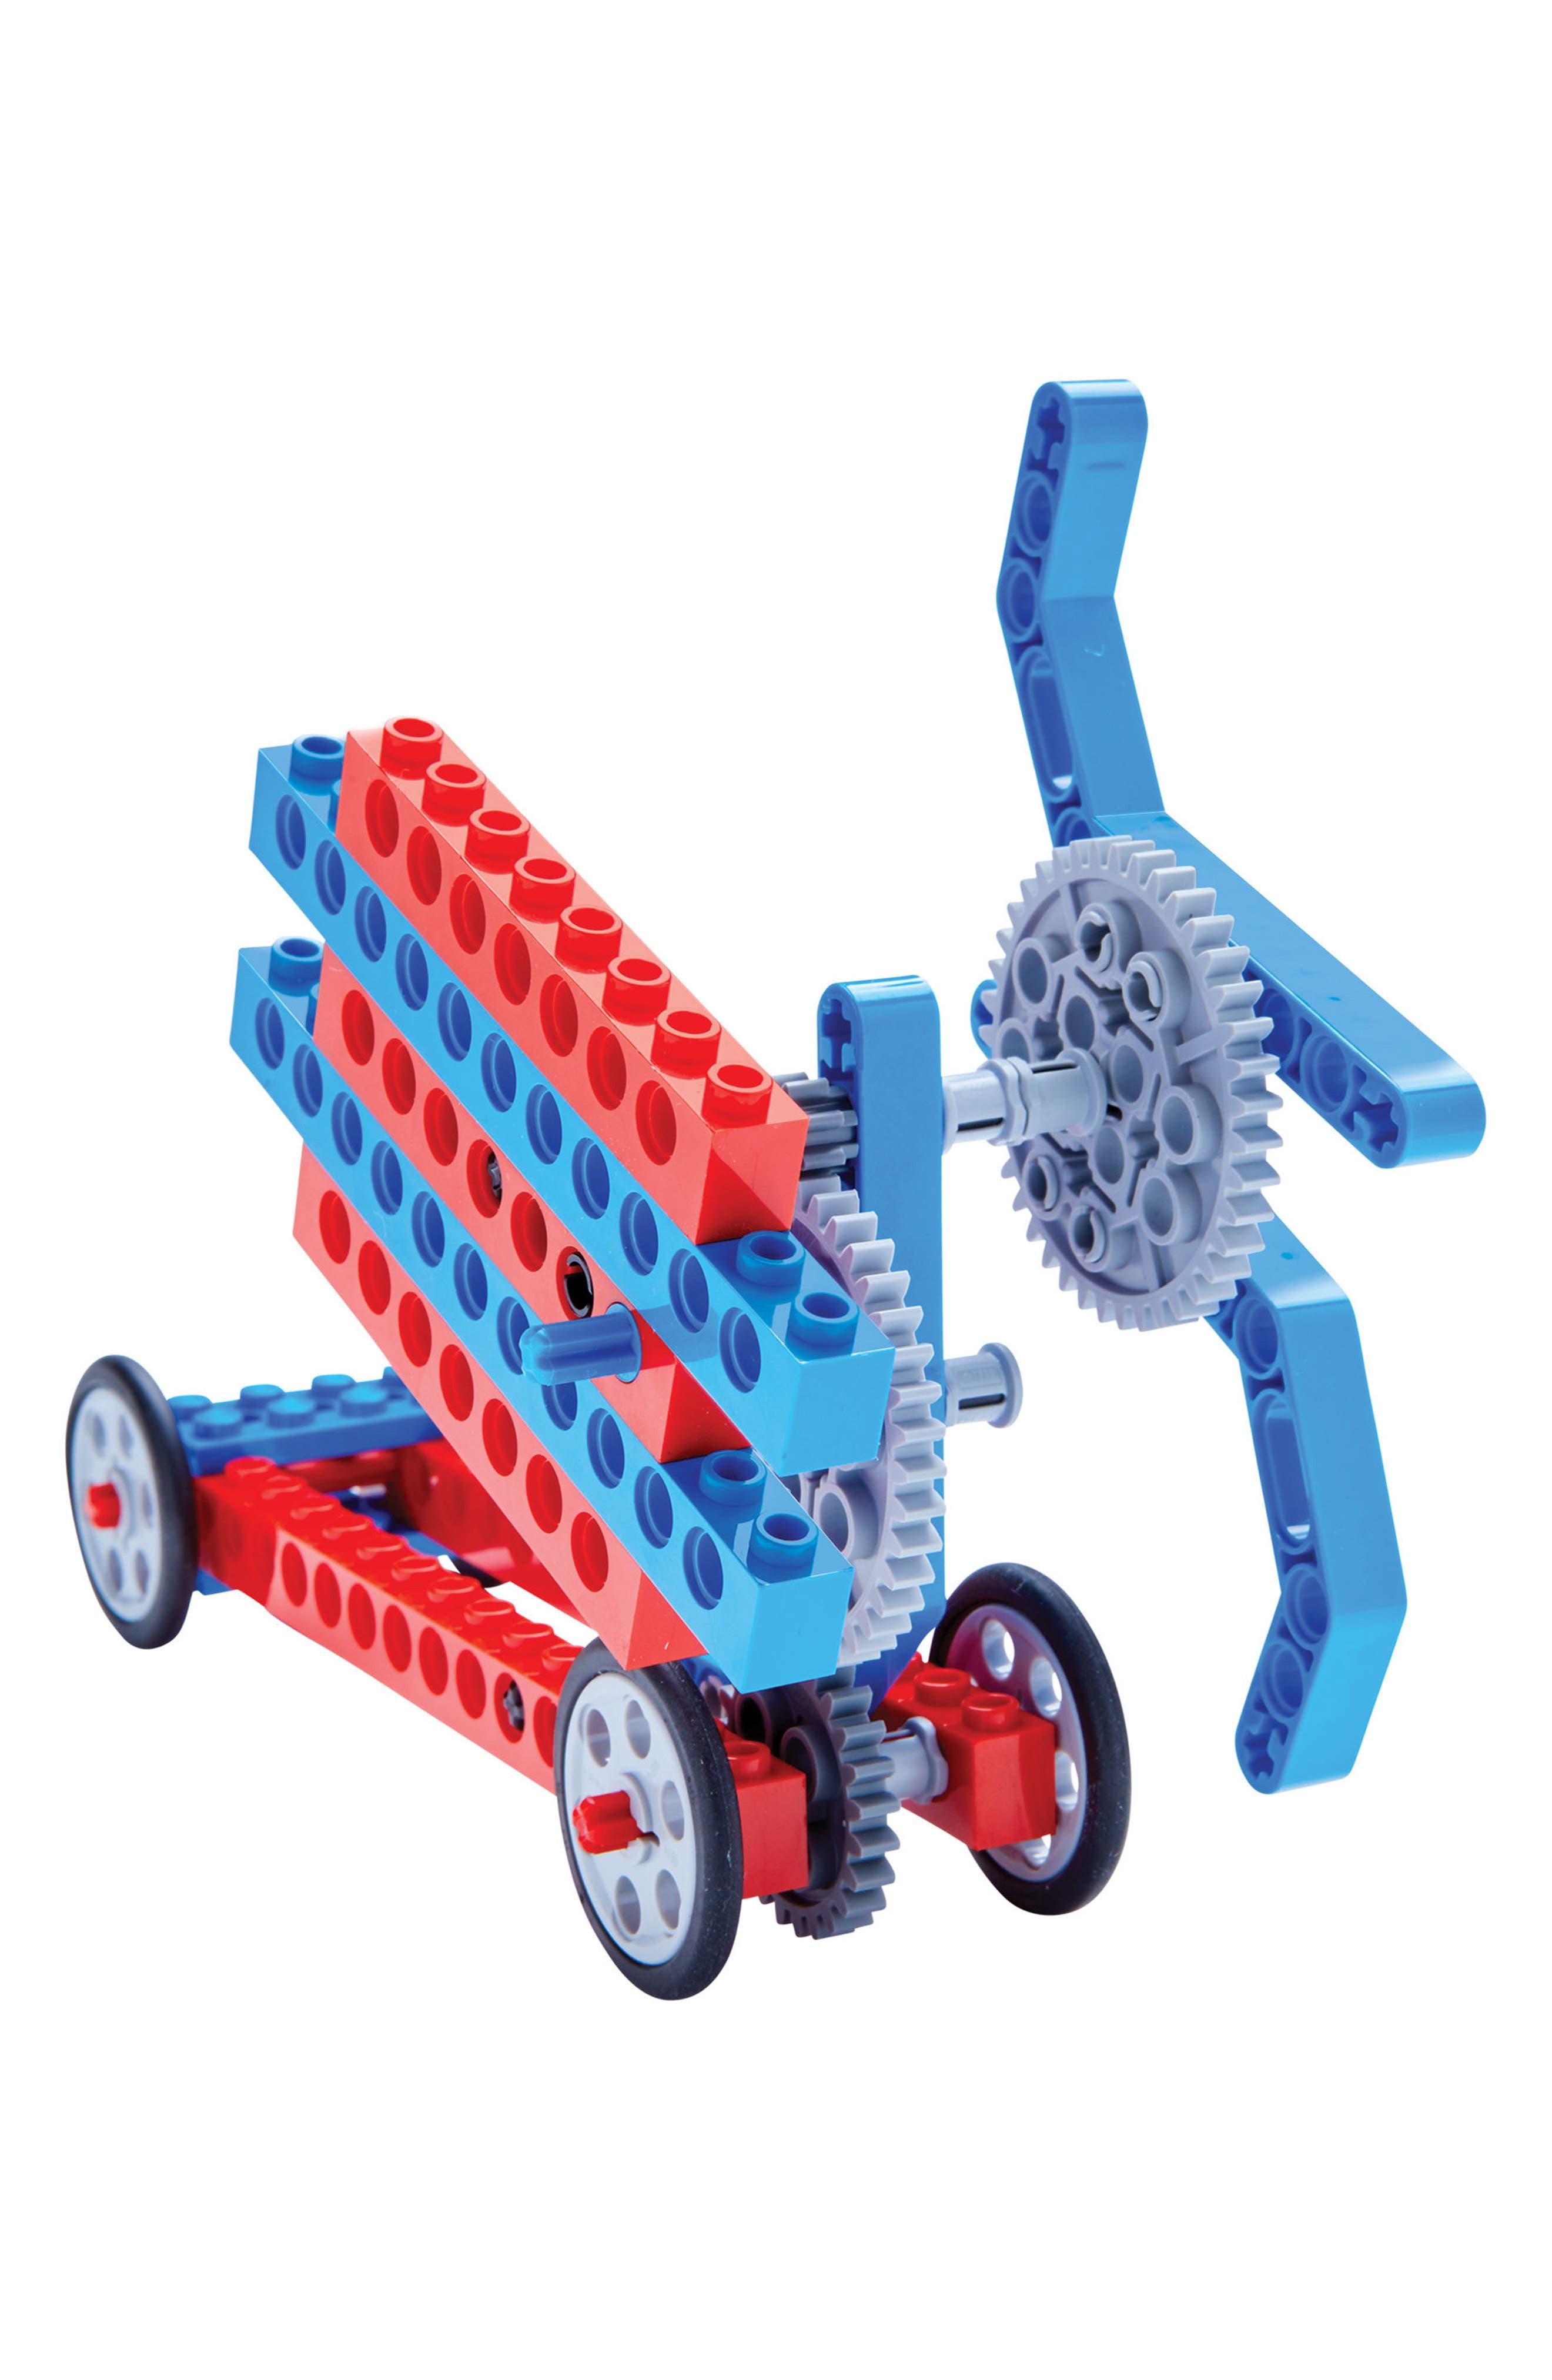 LEGO<sup>®</sup> Gadgets Activity Set,                             Alternate thumbnail 10, color,                             NONE